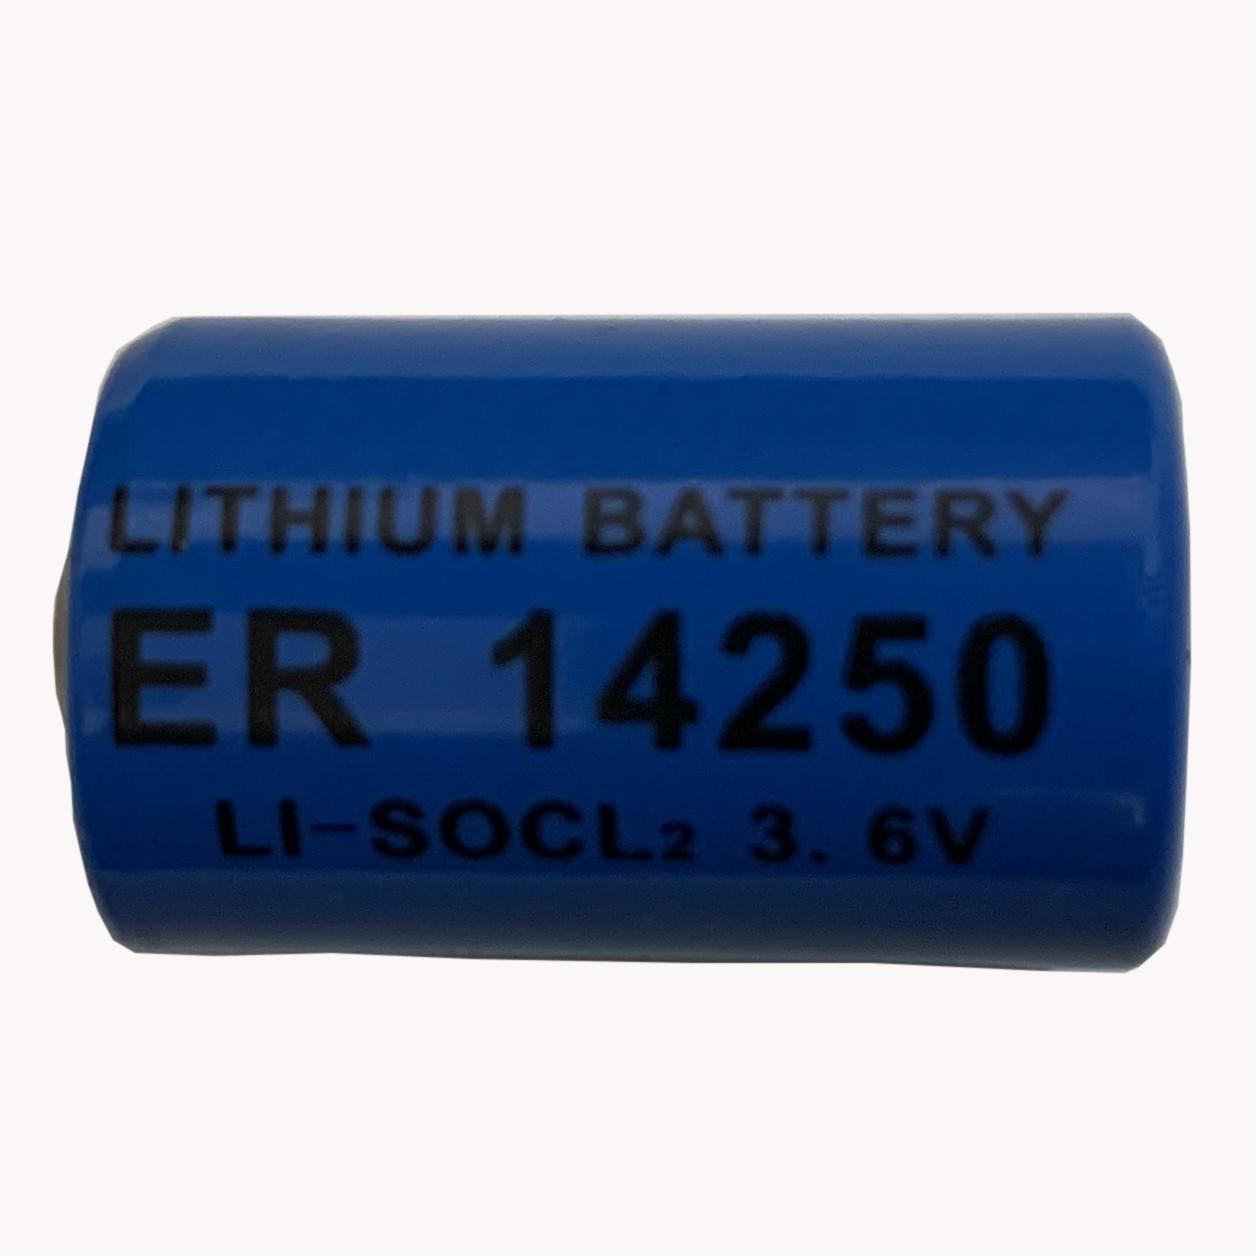 Литиевая батарейка EWT 3,6V 14250 Saft Li-SOCL2 Saft